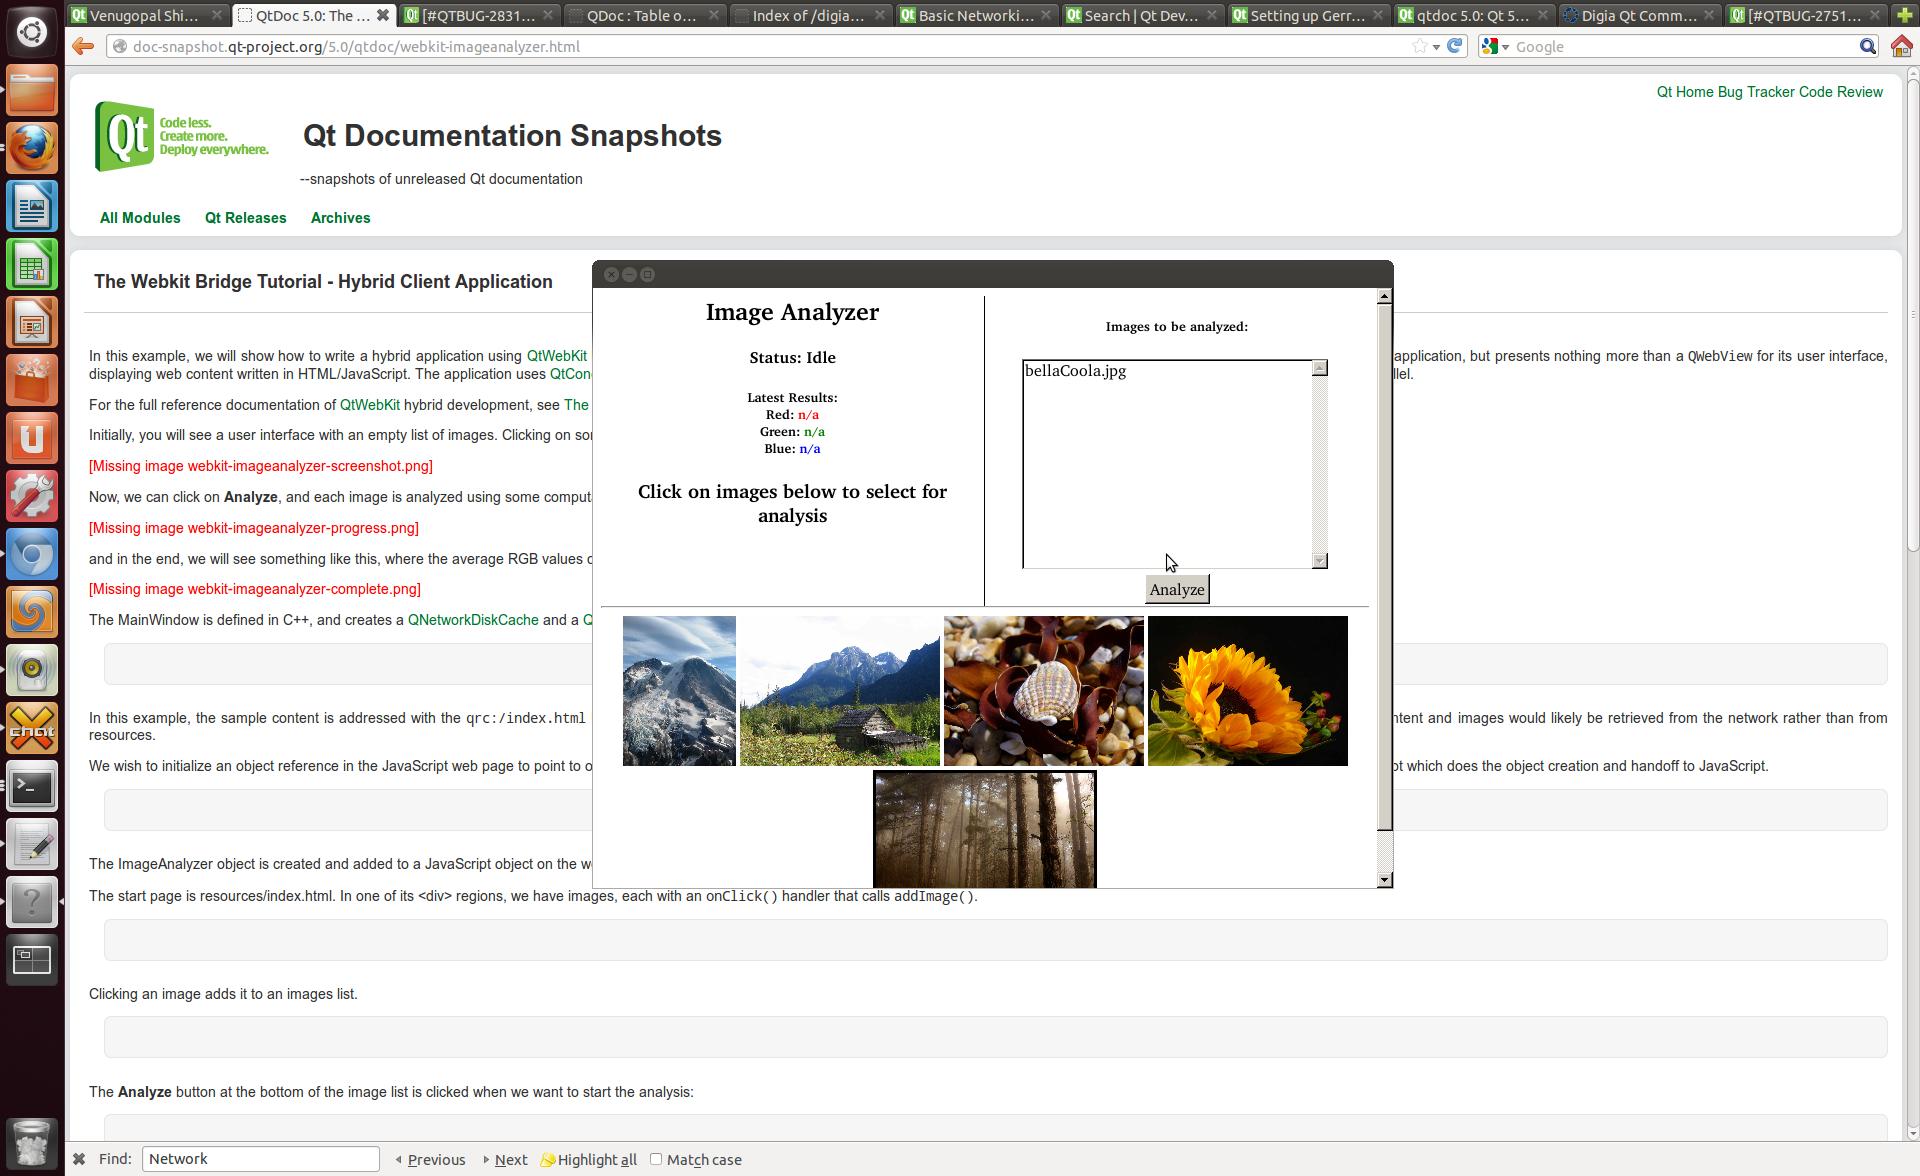 The Webkit Bridge Tutorial - Hybrid Client Application | Qt